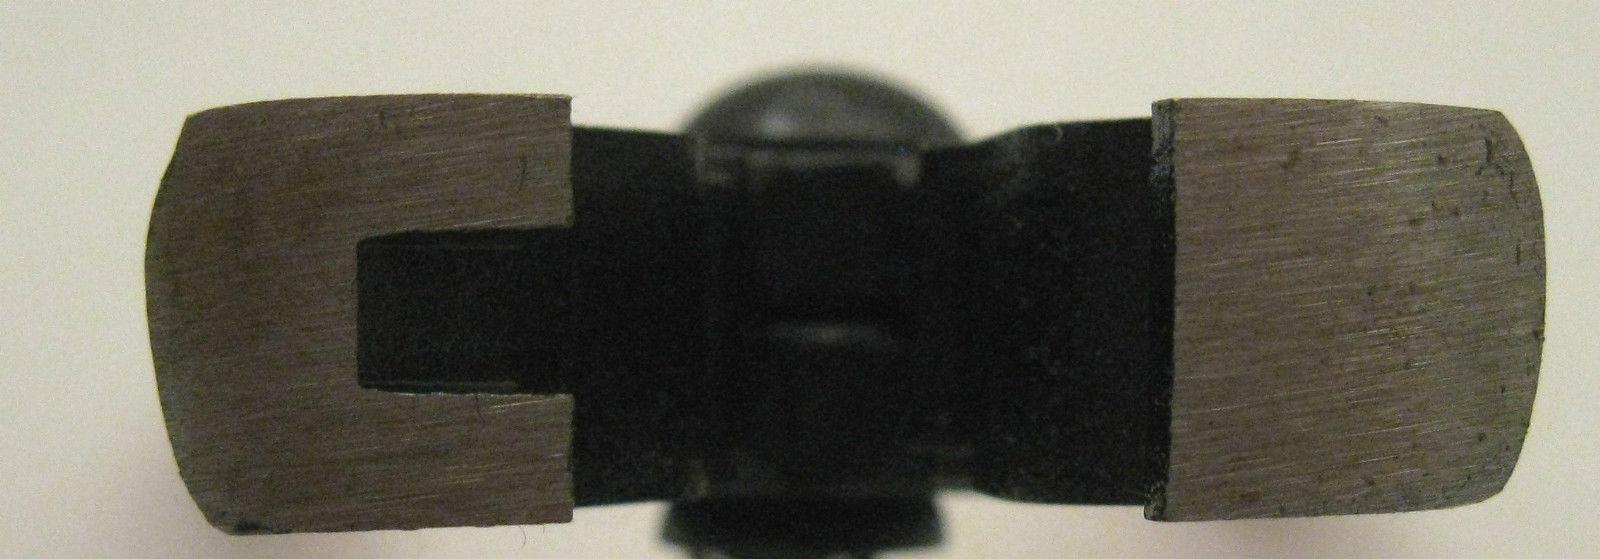 hight resolution of  diy fuel filter replacement kgrhqv qkfdkf5utqbbq821m jmq 60 57 jpg